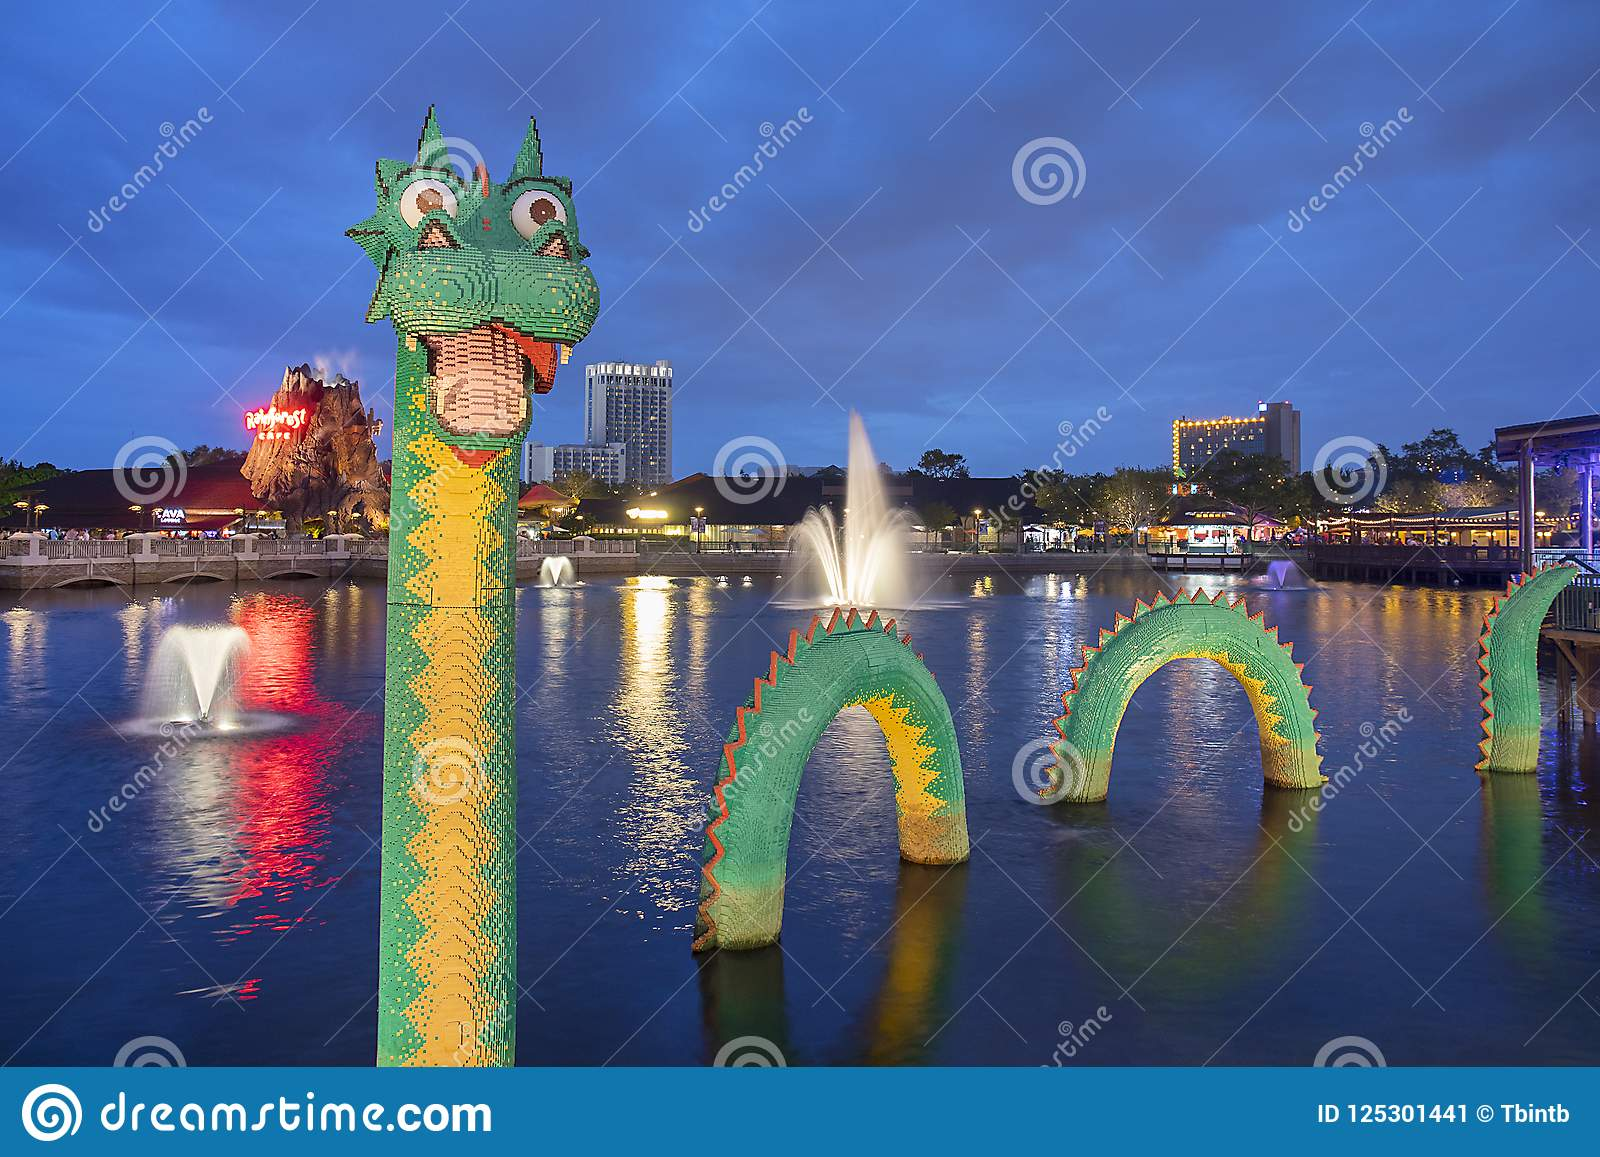 Brickley as molas de Lego Water Dragon At Disney na noite